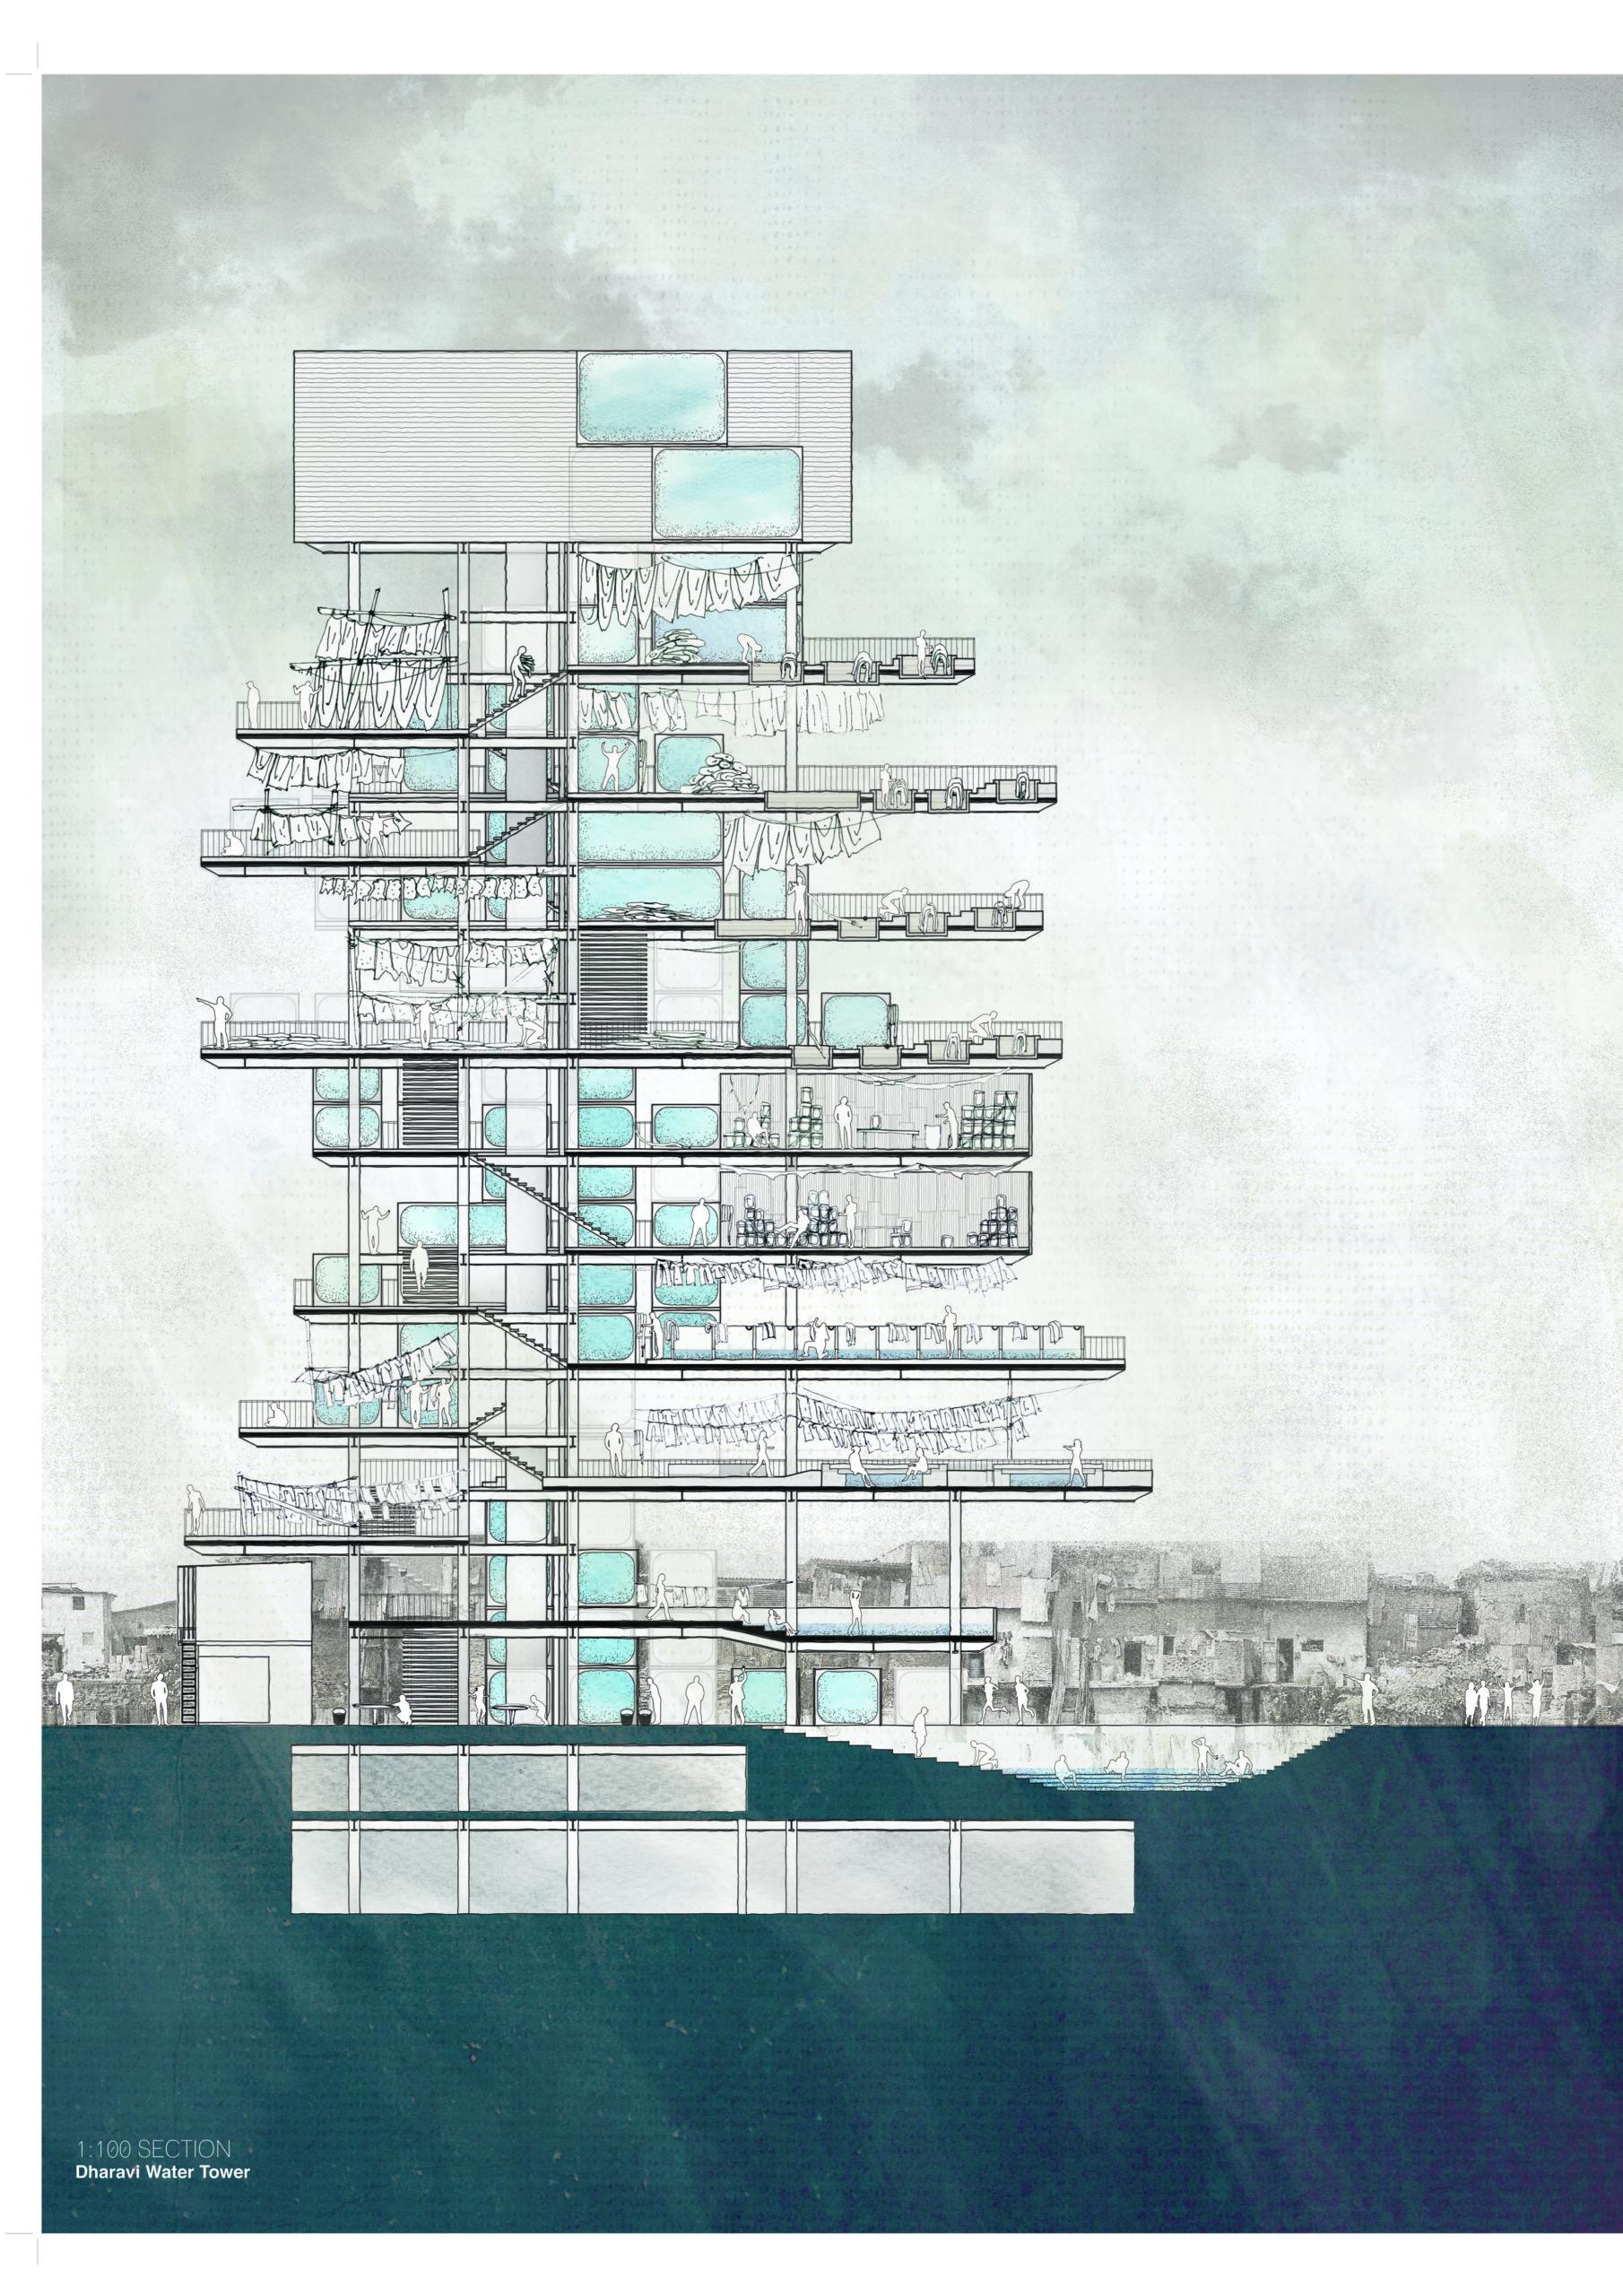 Enlarge Photo: Lawson Lai, Dharavi Water Tower for Informal Urbanism, 2011